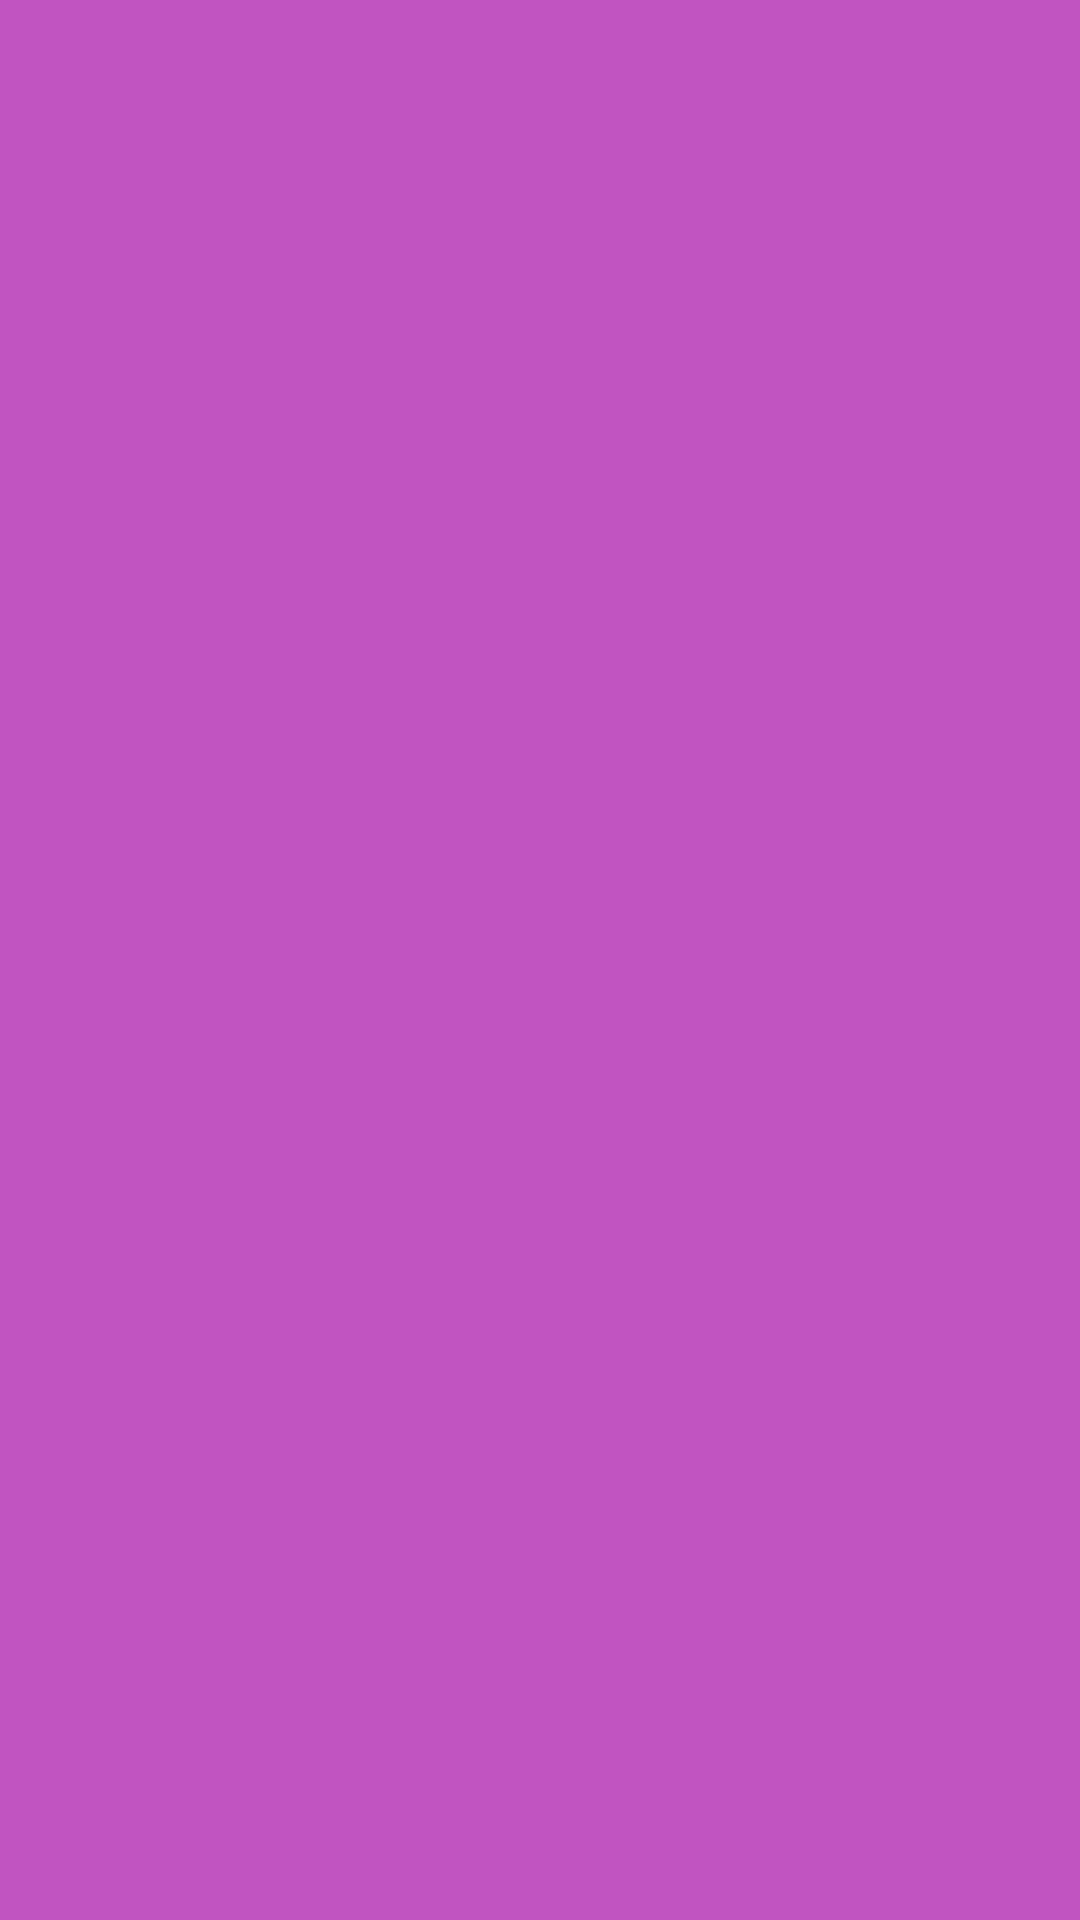 1080x1920 Fuchsia Crayola Solid Color Background